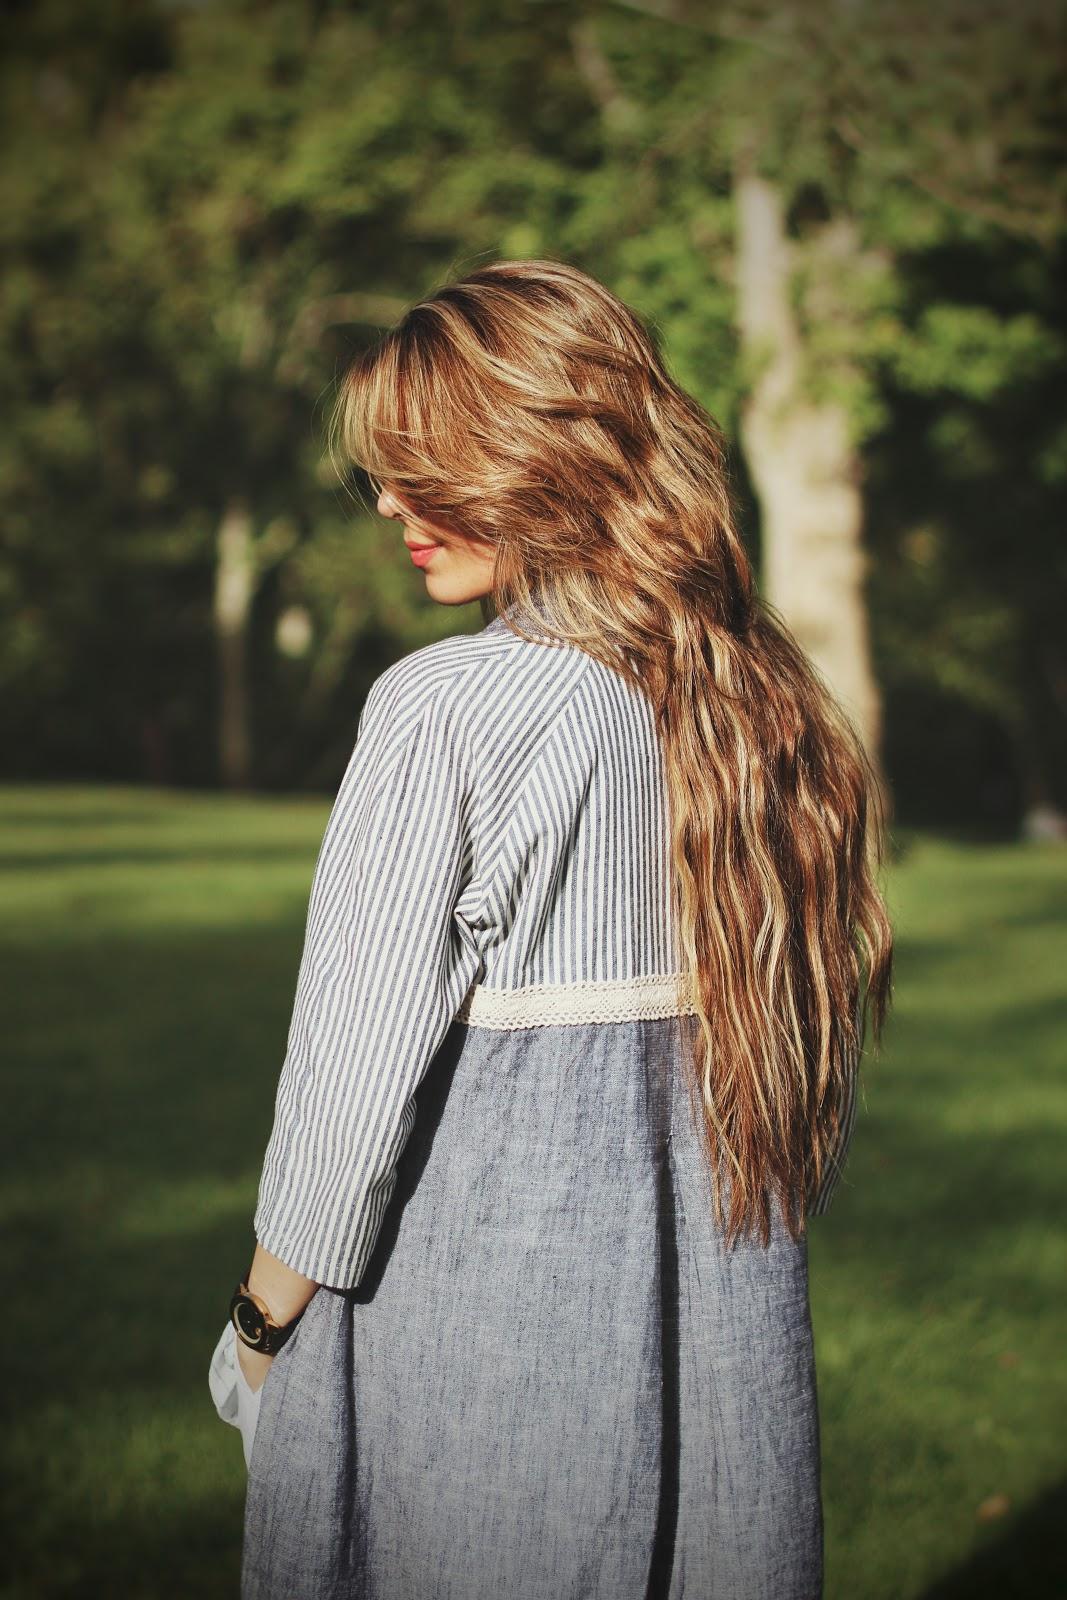 Hair Growth Routine While Getting Rid Of Hair Breakage blue dress